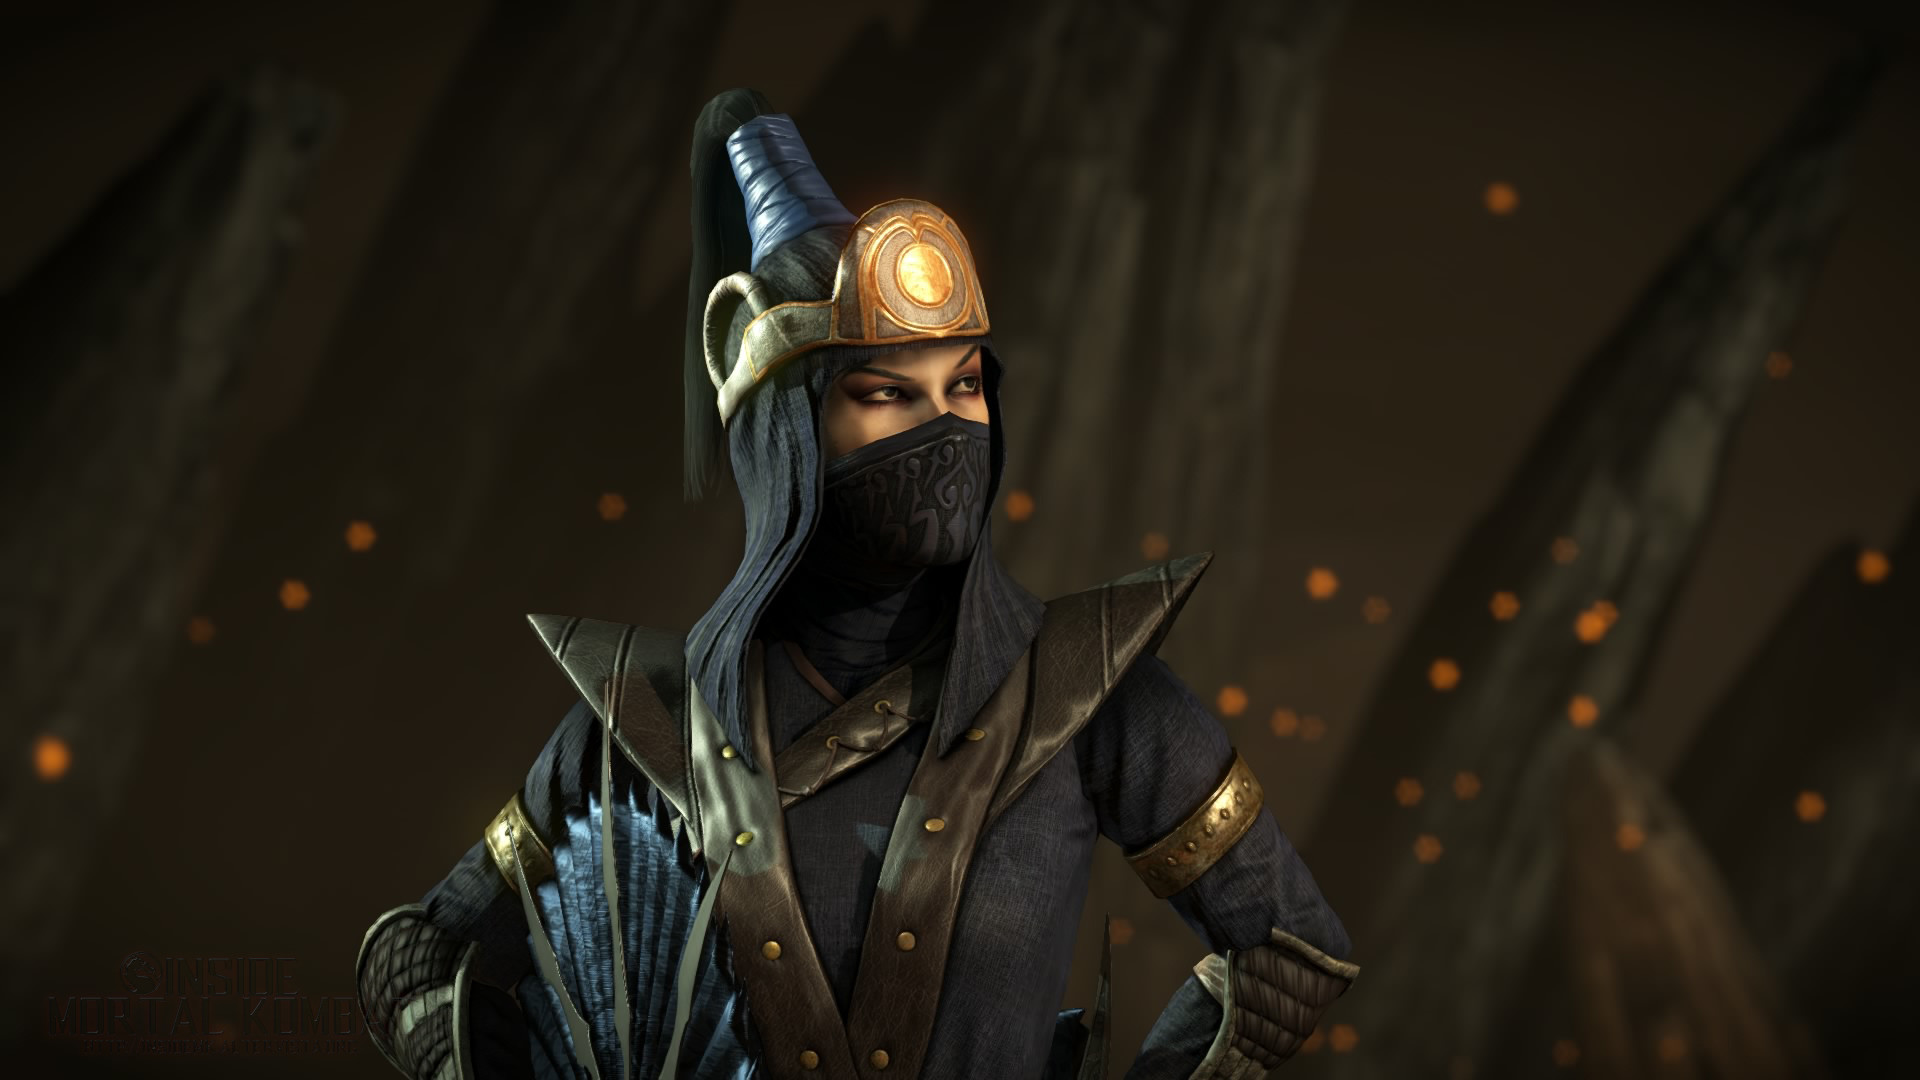 Image – Mortal-Kombat-X Kitana Jingu 2-1-.jpg | Mortal Kombat Wiki | FANDOM  powered by Wikia